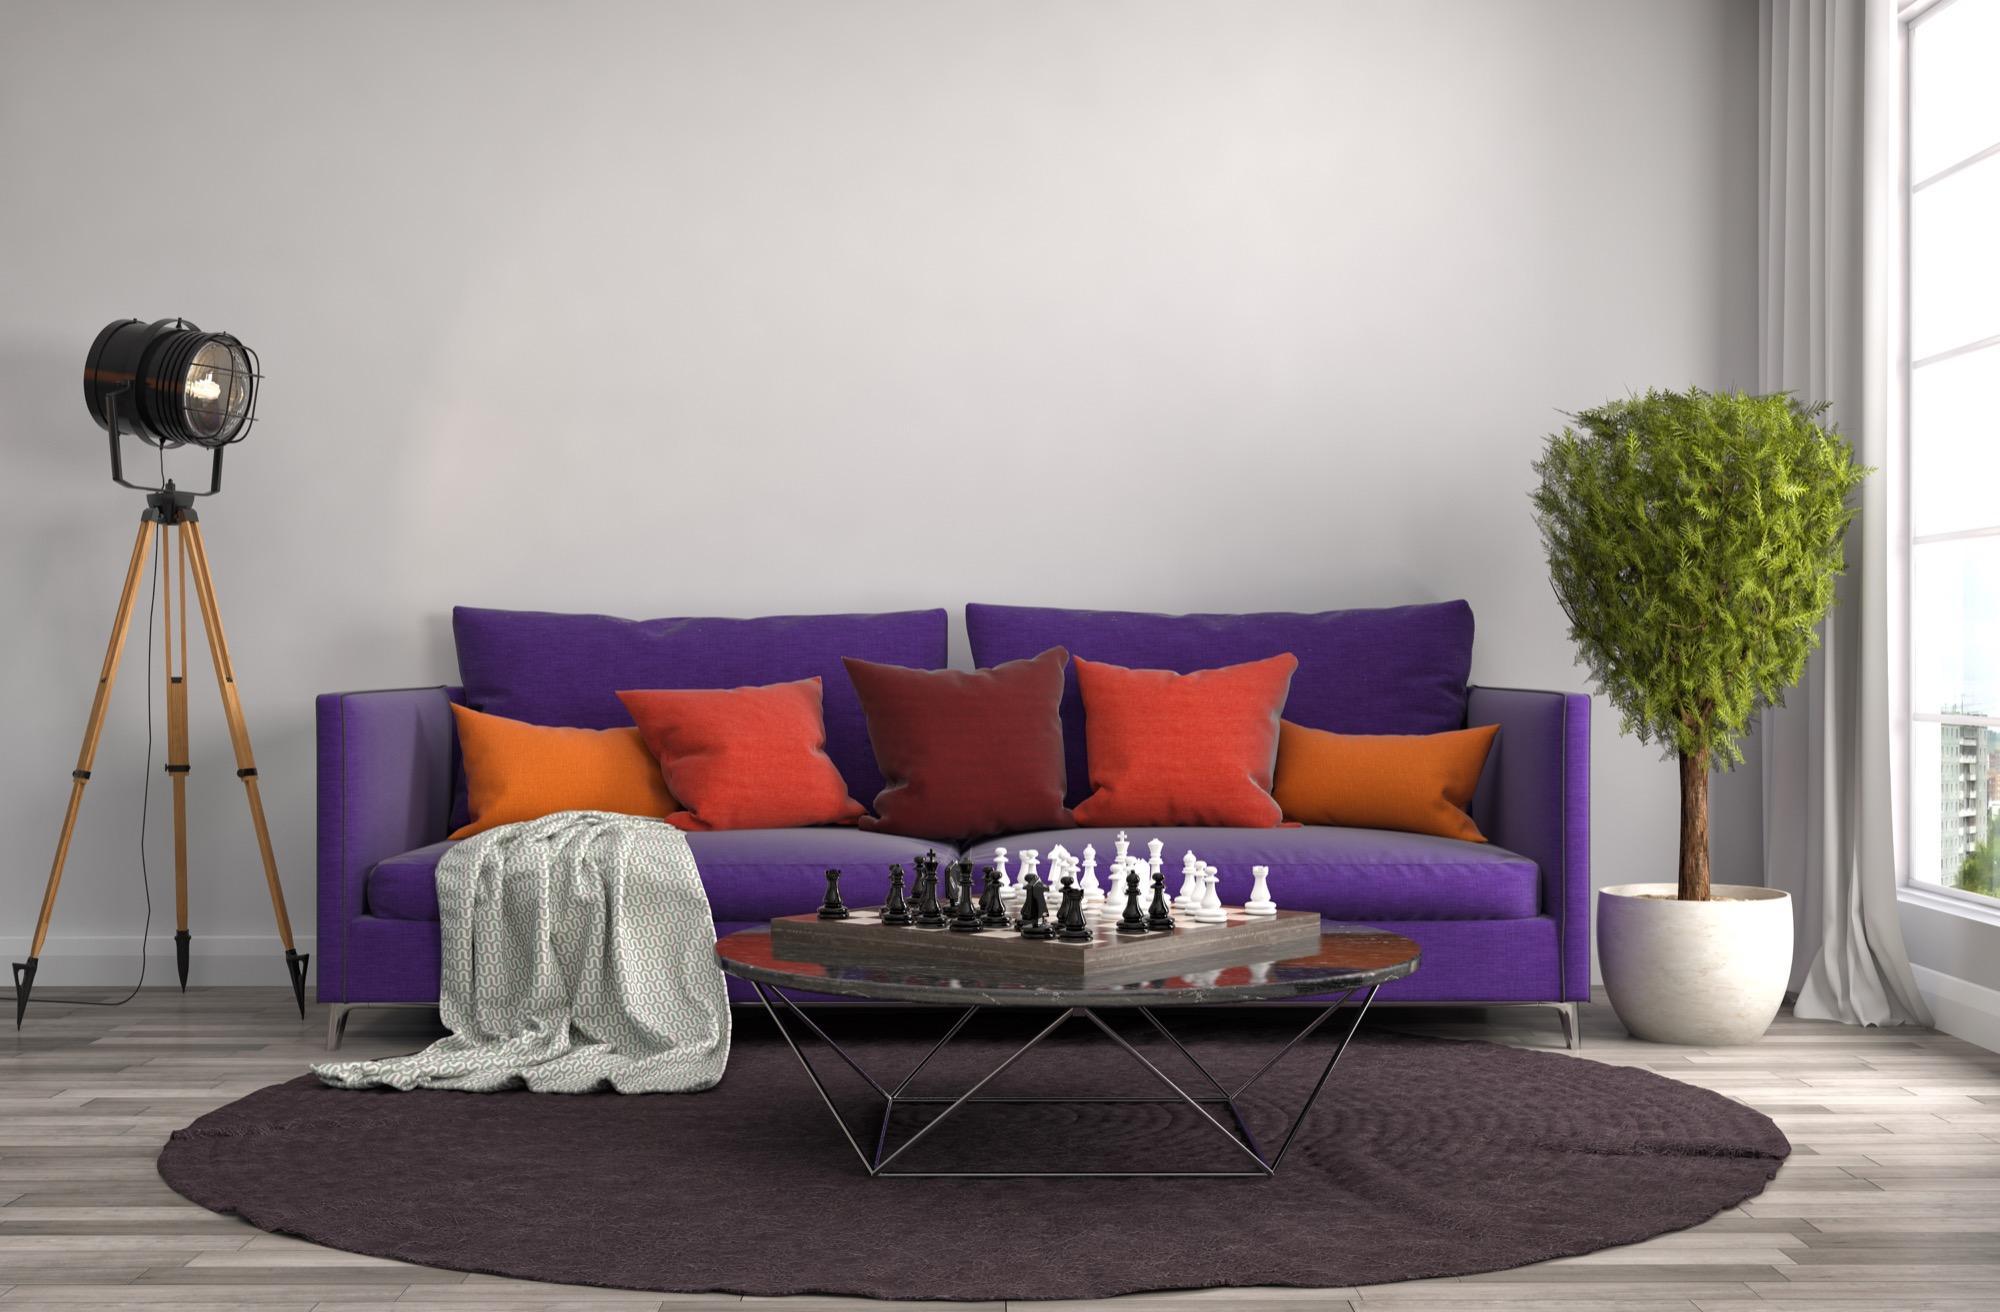 Sofa in Violett